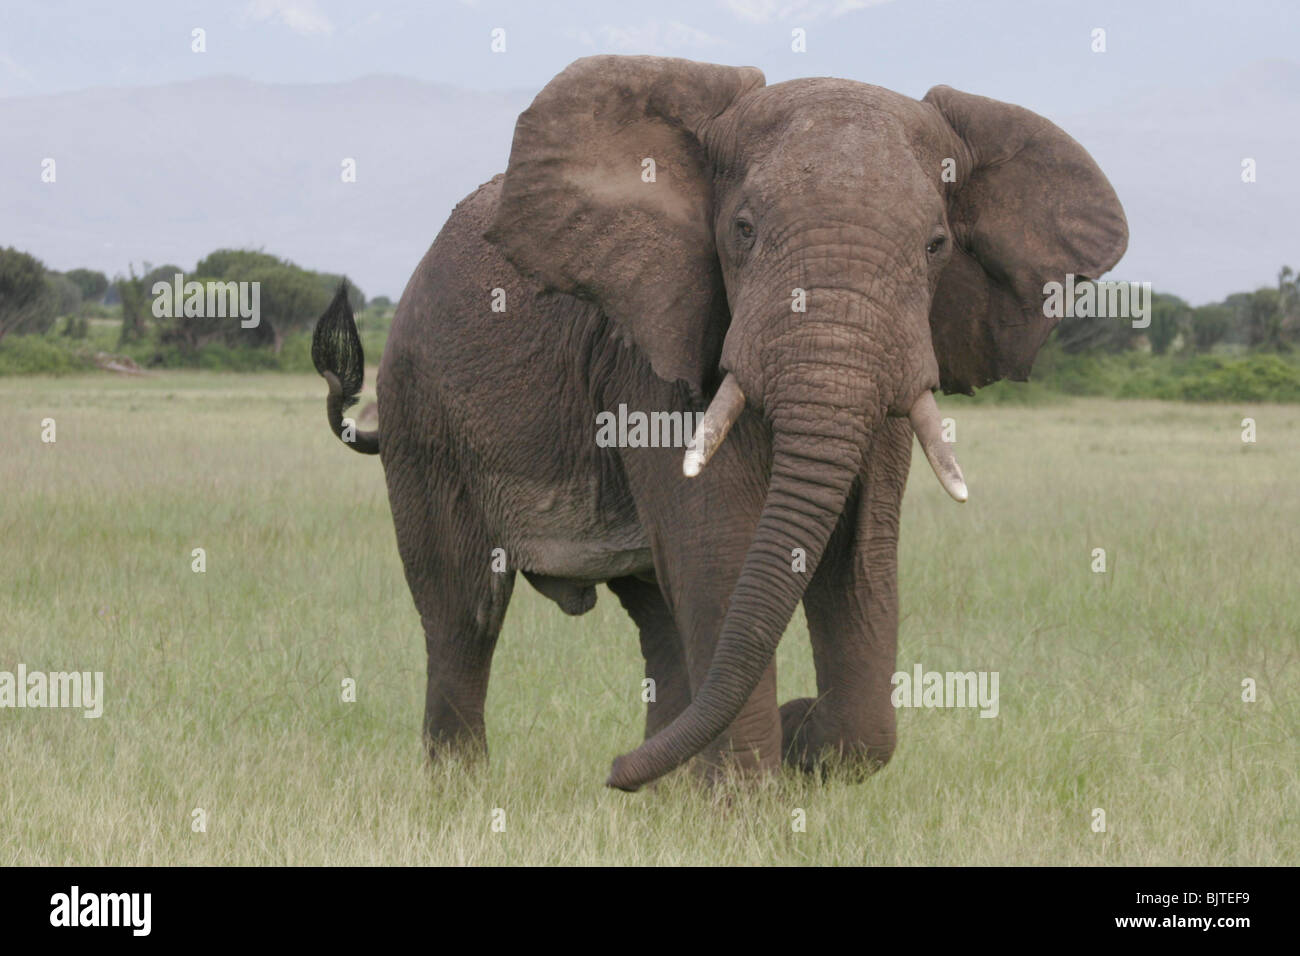 Elephant con il Rwenzori Mountains in background. Queen Elizabeth National Park. Uganda. L'Africa. Immagini Stock